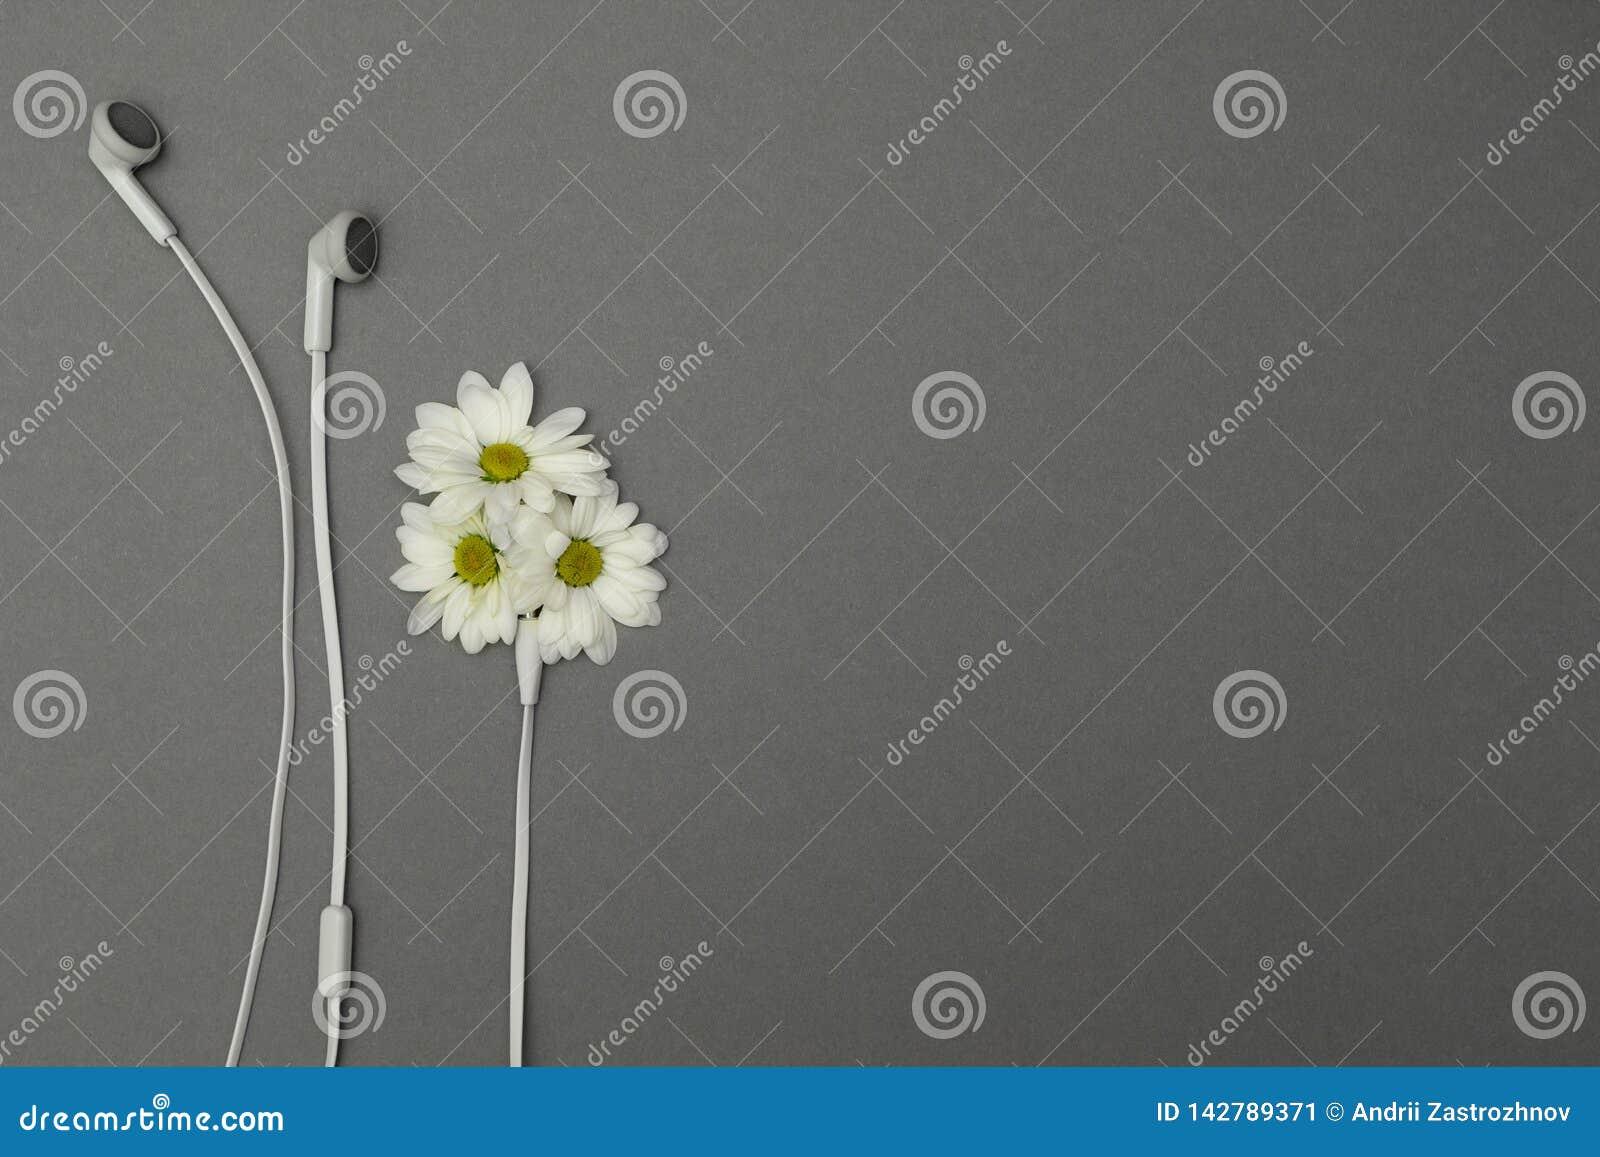 Цветки и наушники, место для текста